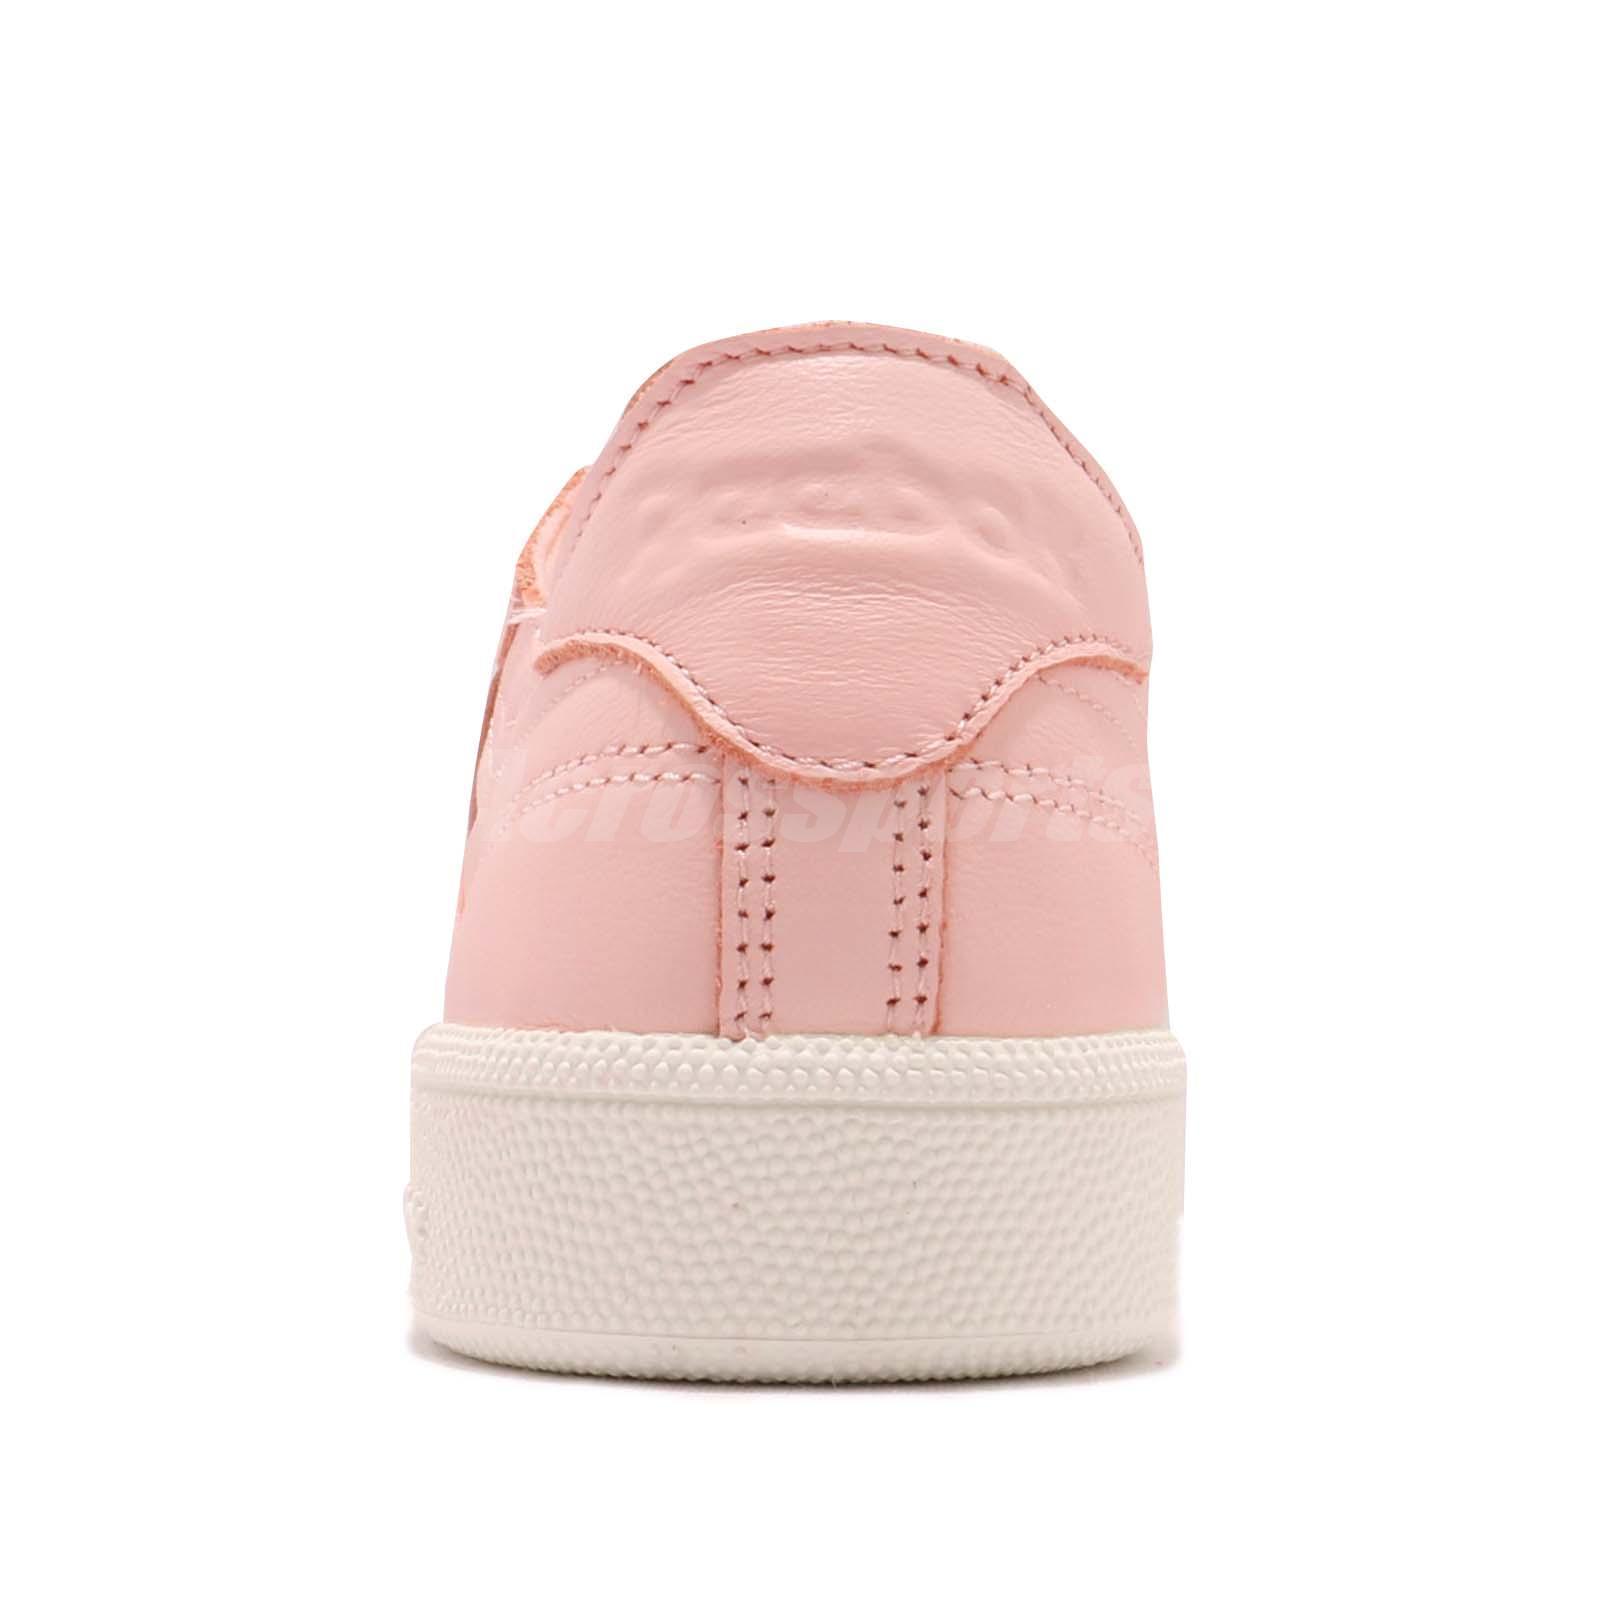 833eafcc141a2 Reebok Club C 85 DCN Luna Pink Chalk Leather Women Casual Shoes ...